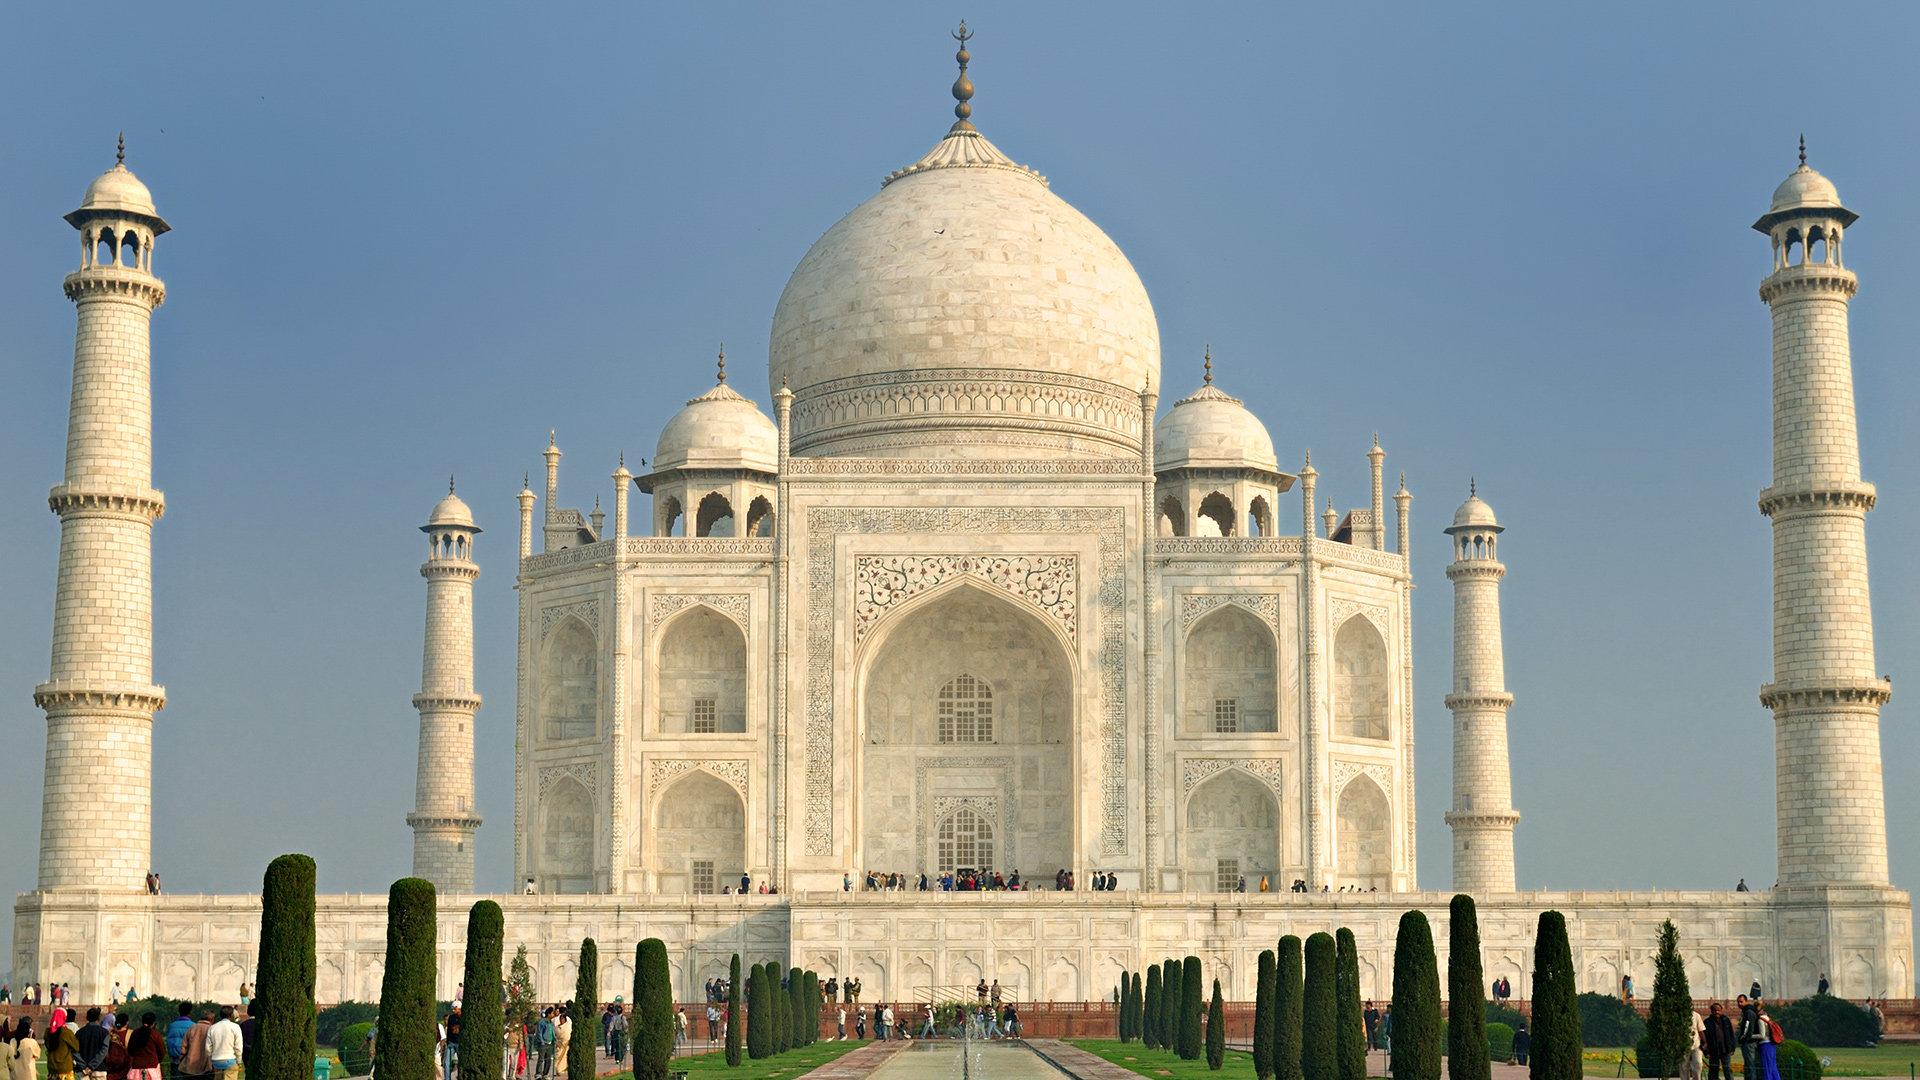 Taj Mahal Wallpapers 1920x1080 Full Hd 1080p Desktop Backgrounds